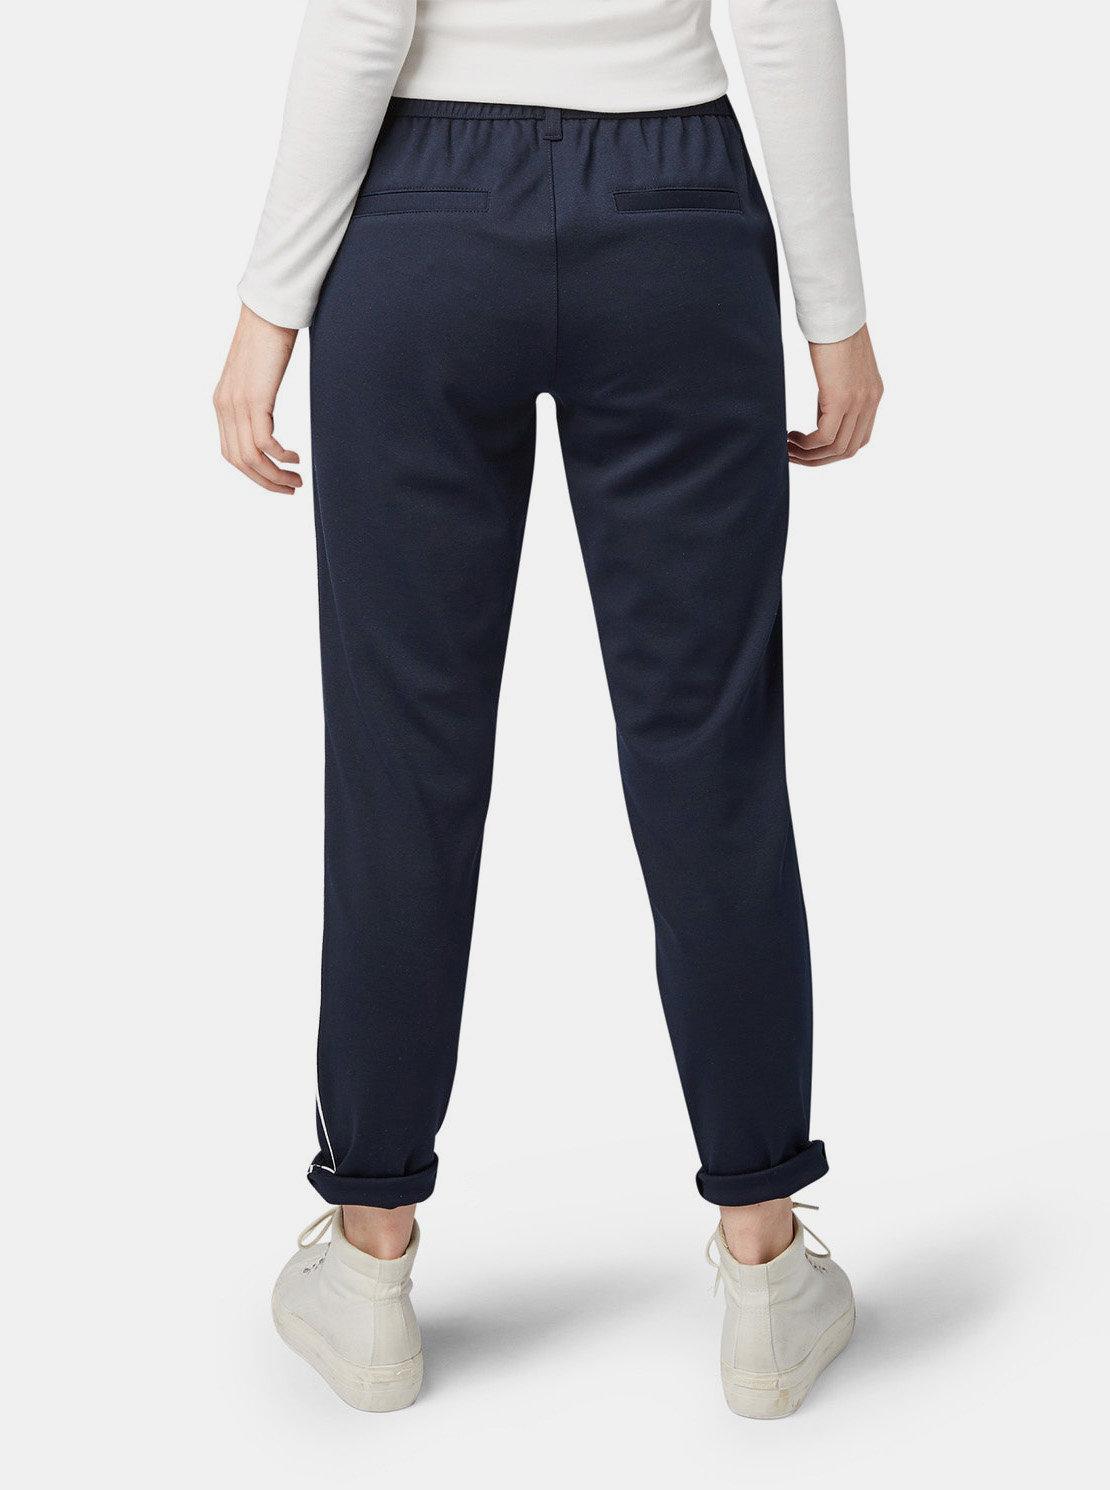 ba4c035a1460 Tmavomodré dámske nohavice Tom Tailor Denim ...